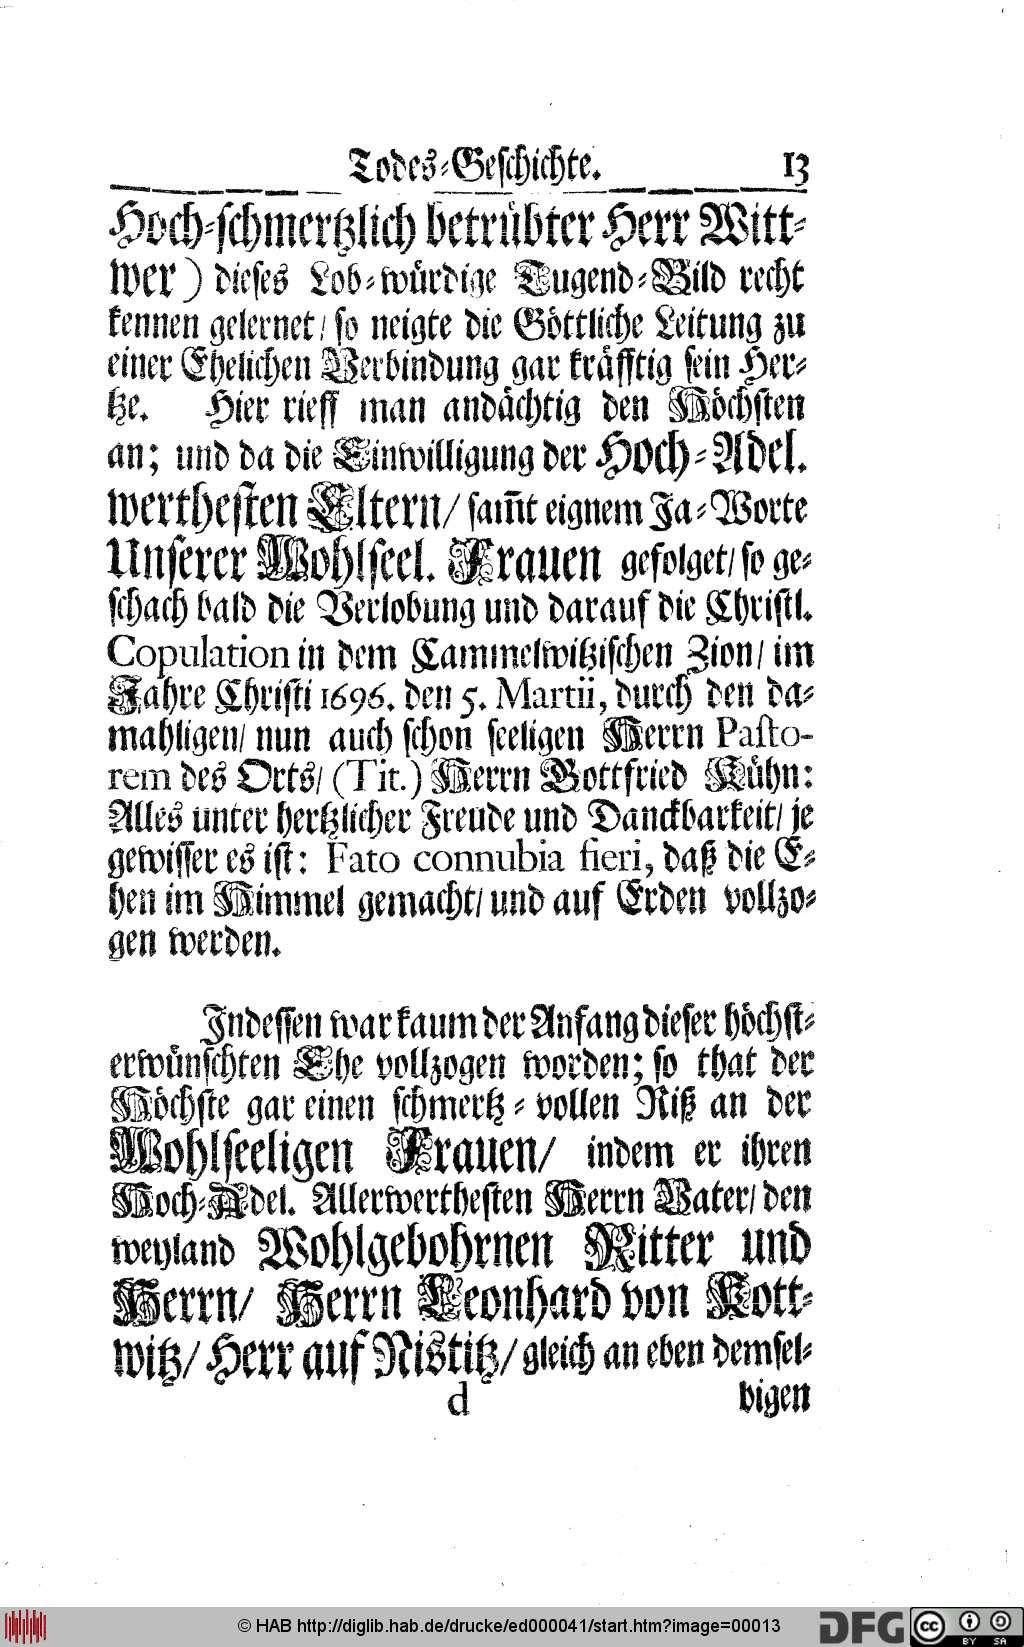 http://diglib.hab.de/drucke/ed000041/00013.jpg